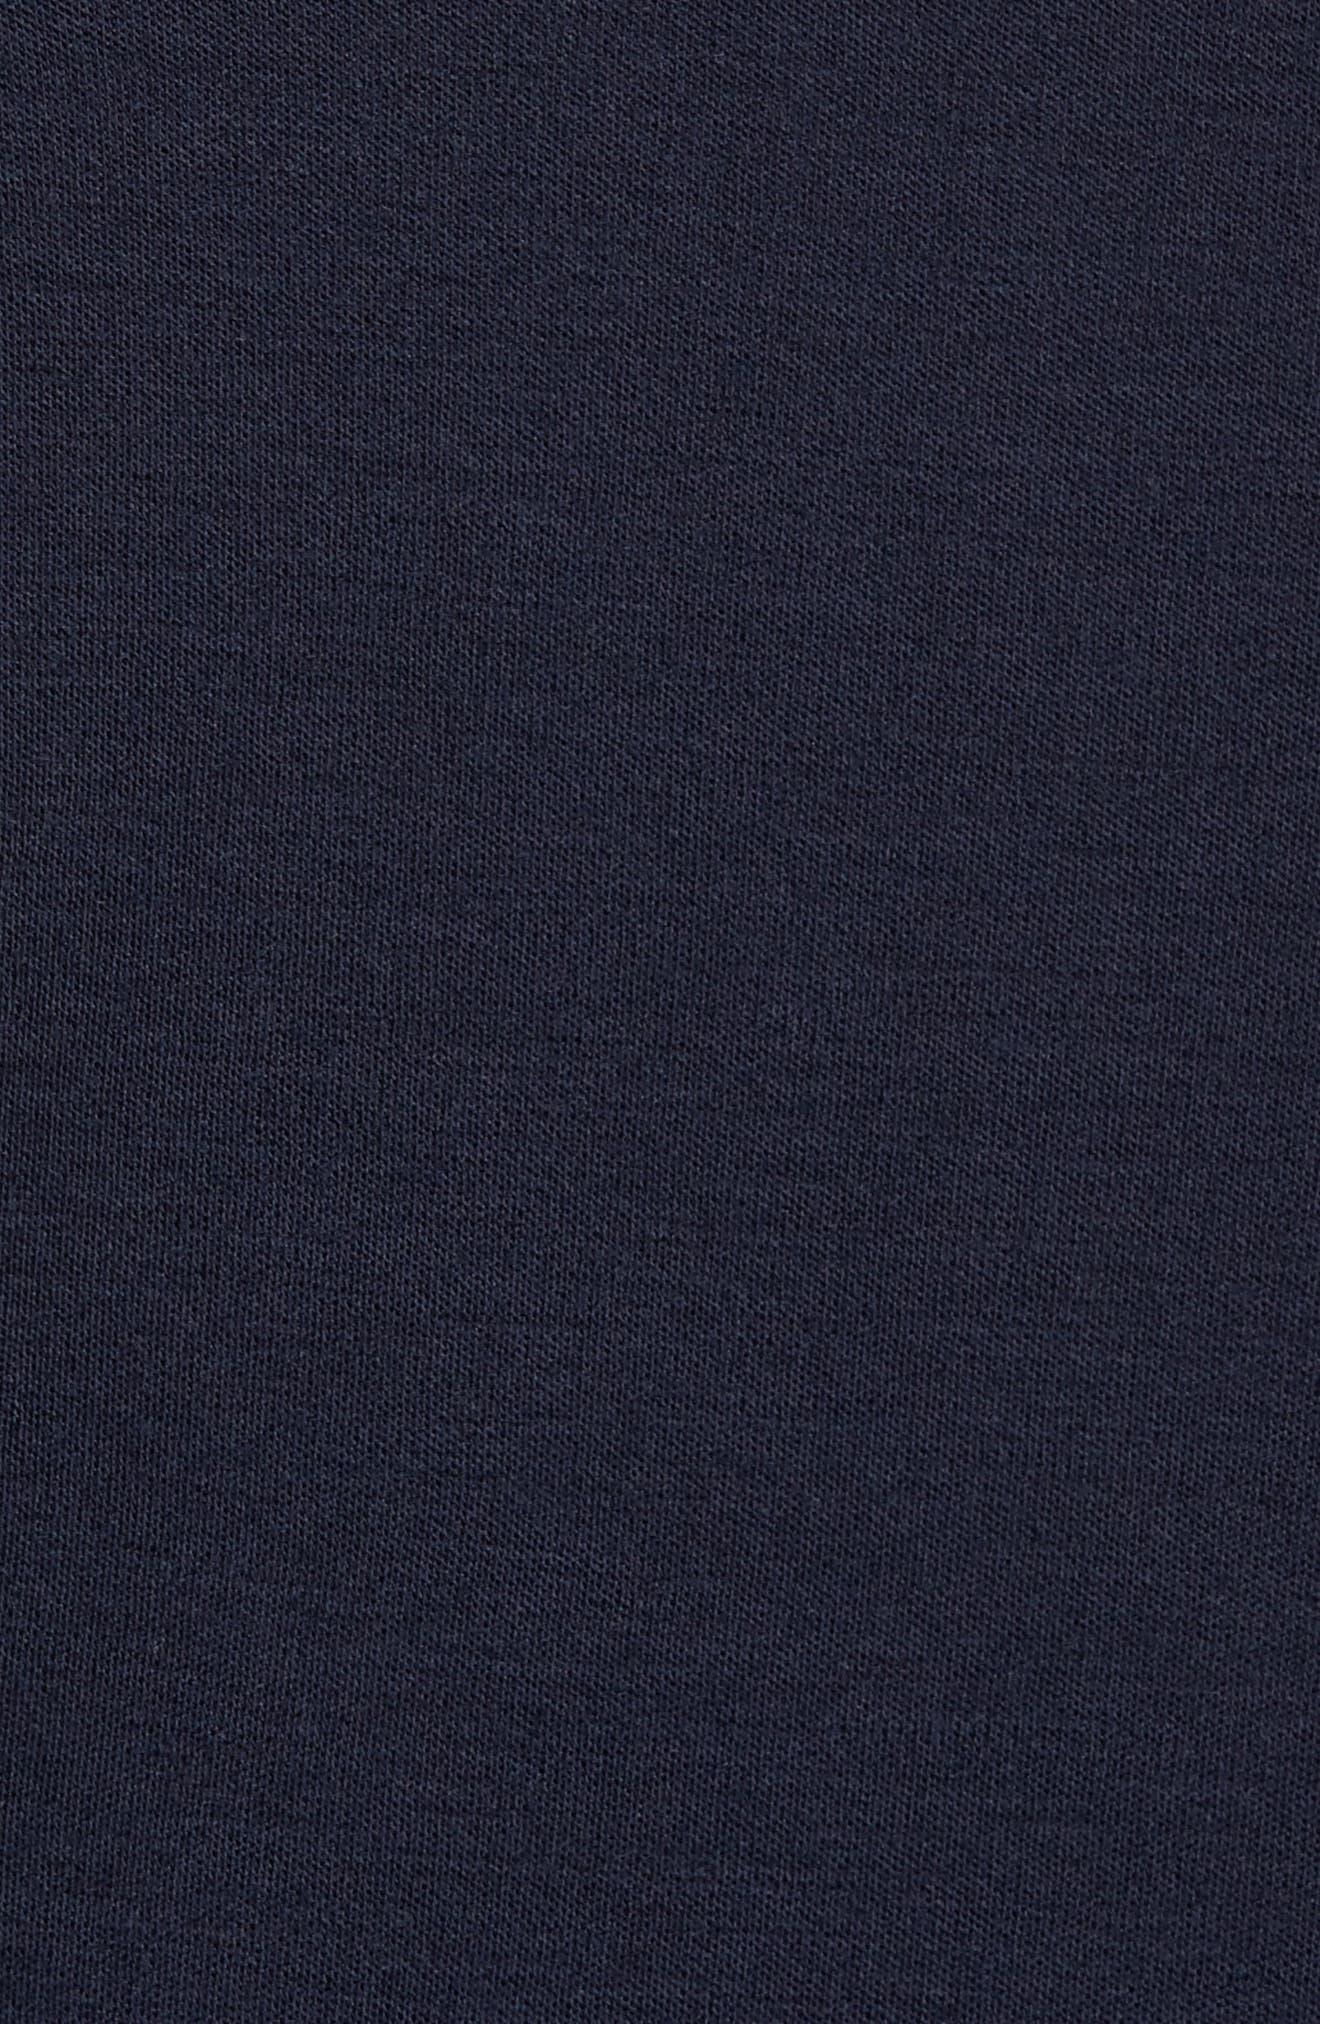 250 Sport Merino Wool Zip Jacket,                             Alternate thumbnail 5, color,                             Deep Navy